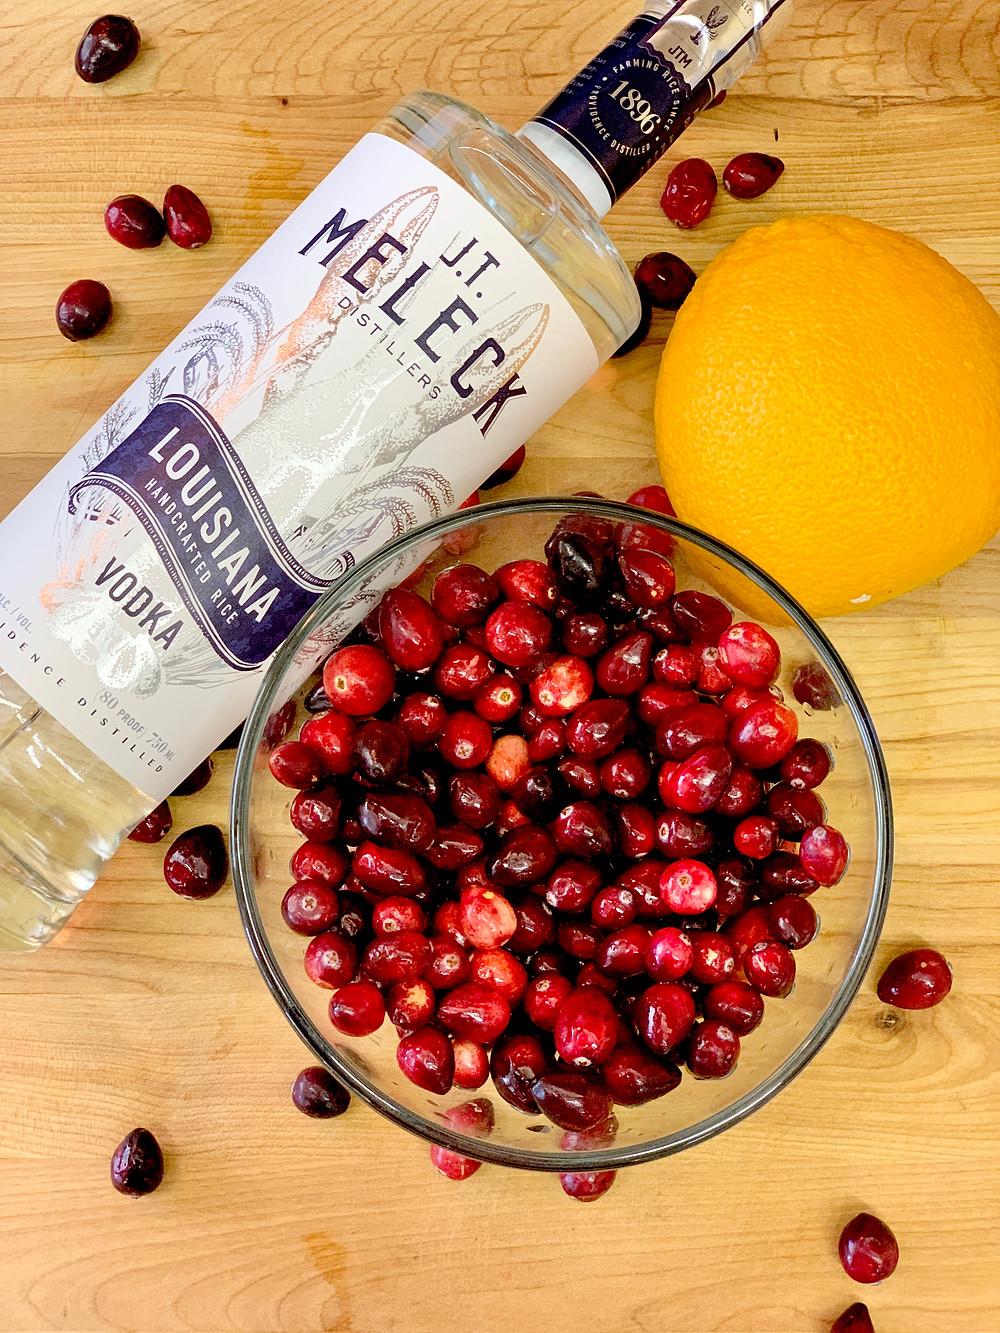 JT Meleck Vodka, cranberry, and orange